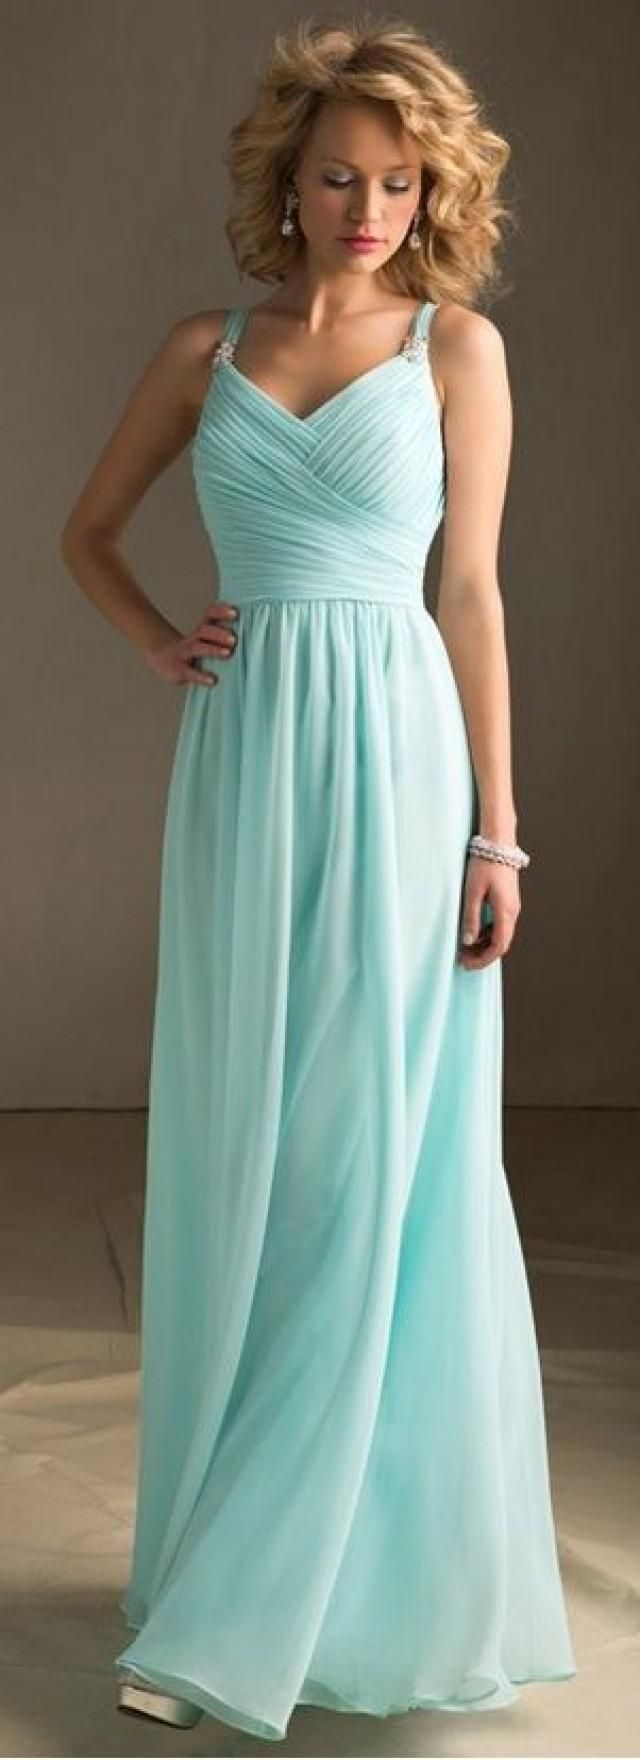 Bridesmaid Dress - Weddbook | My future wedding | Pinterest | Amor